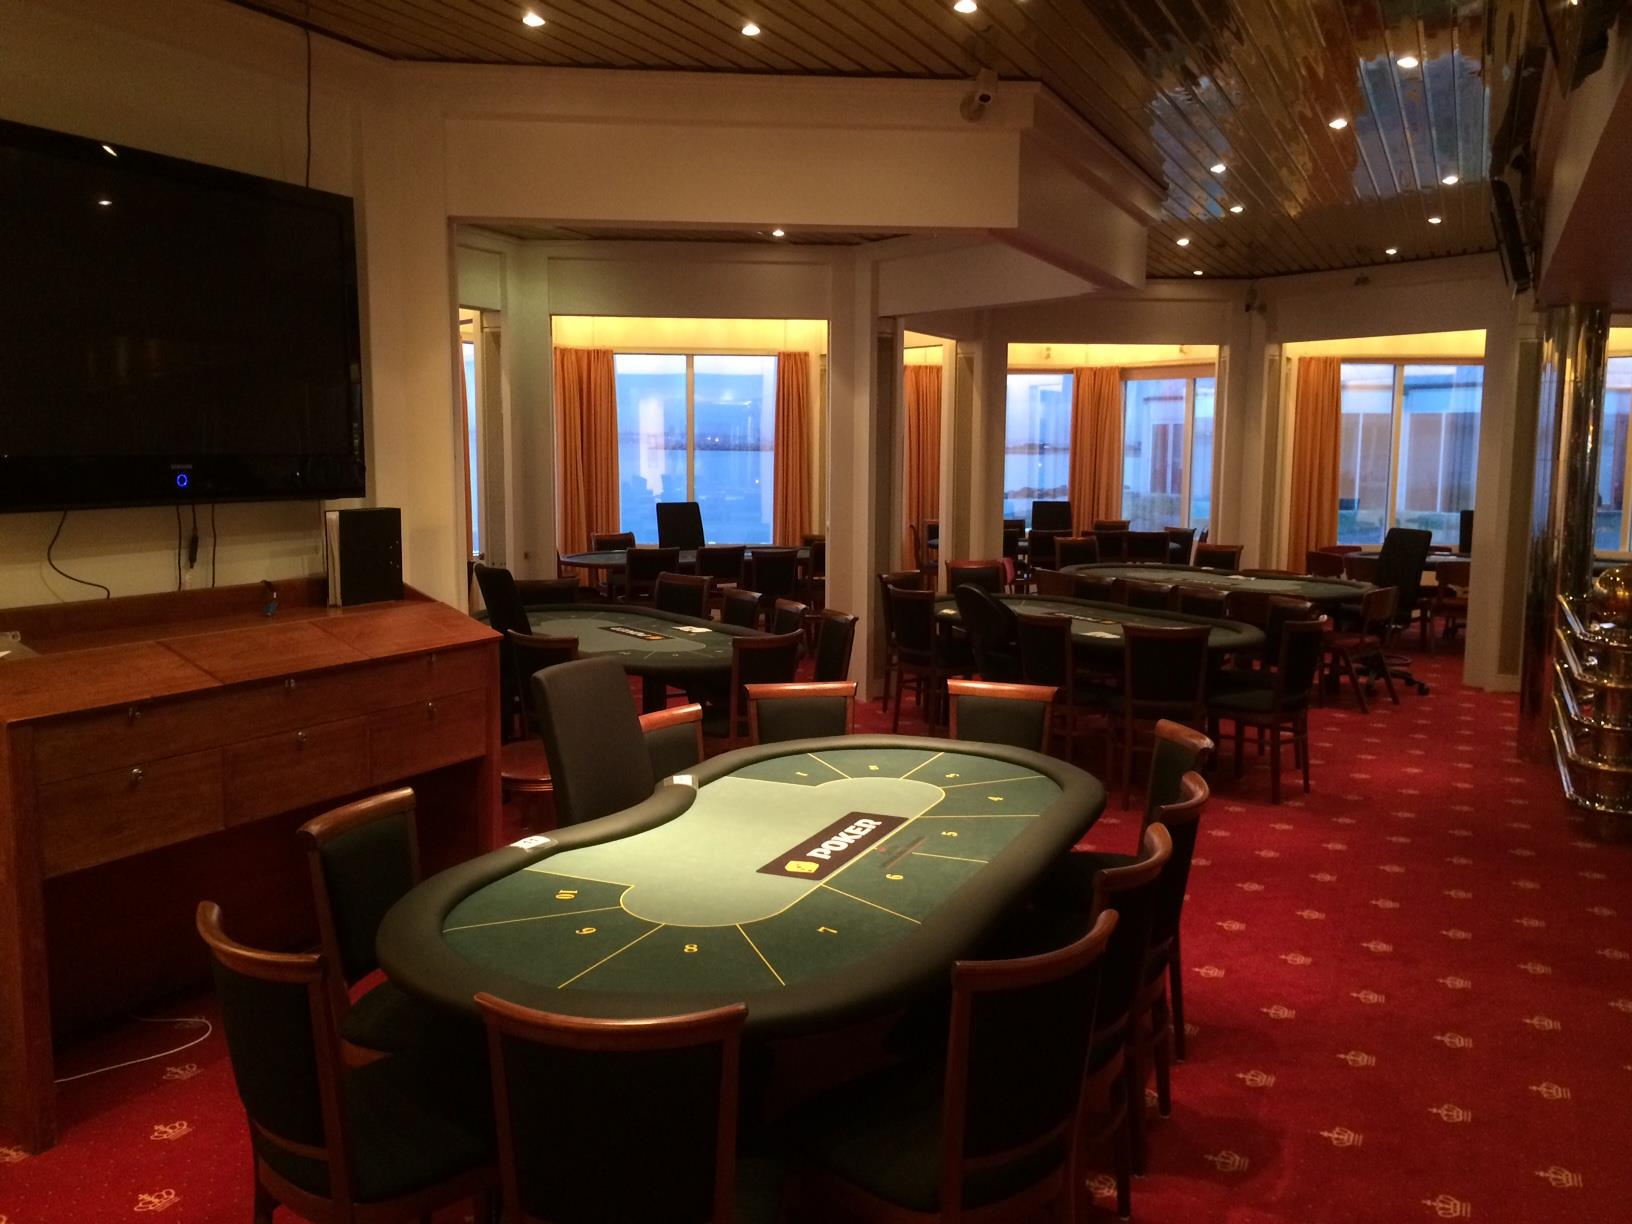 Artikel billede: Fra spille området på Casino Marienlyst